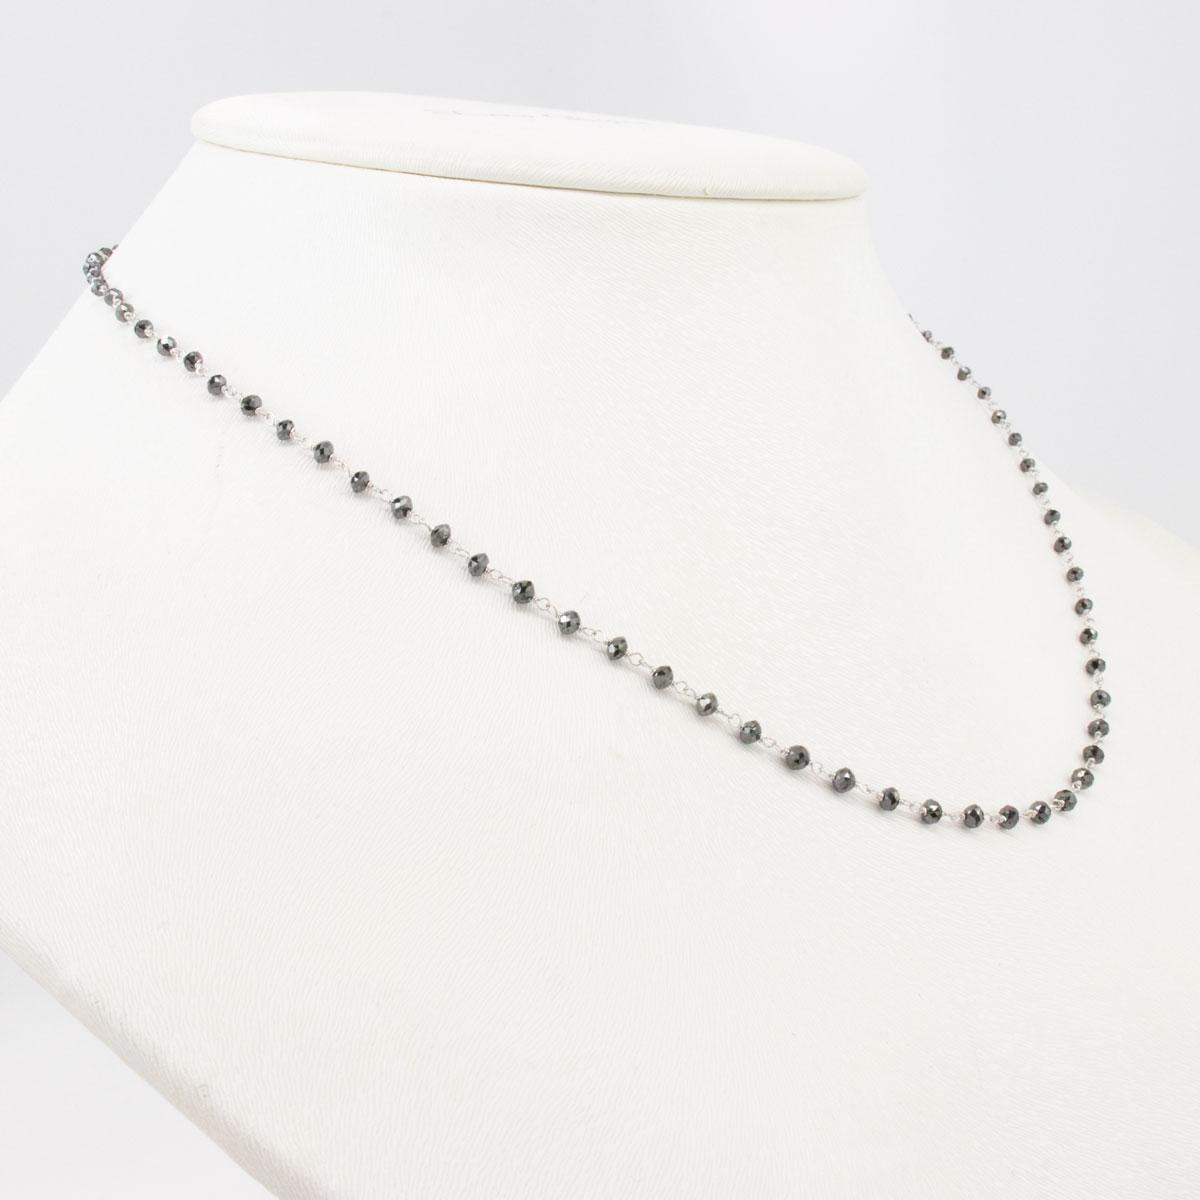 5.3 Carat Black Diamond Necklace, 14k White Gold